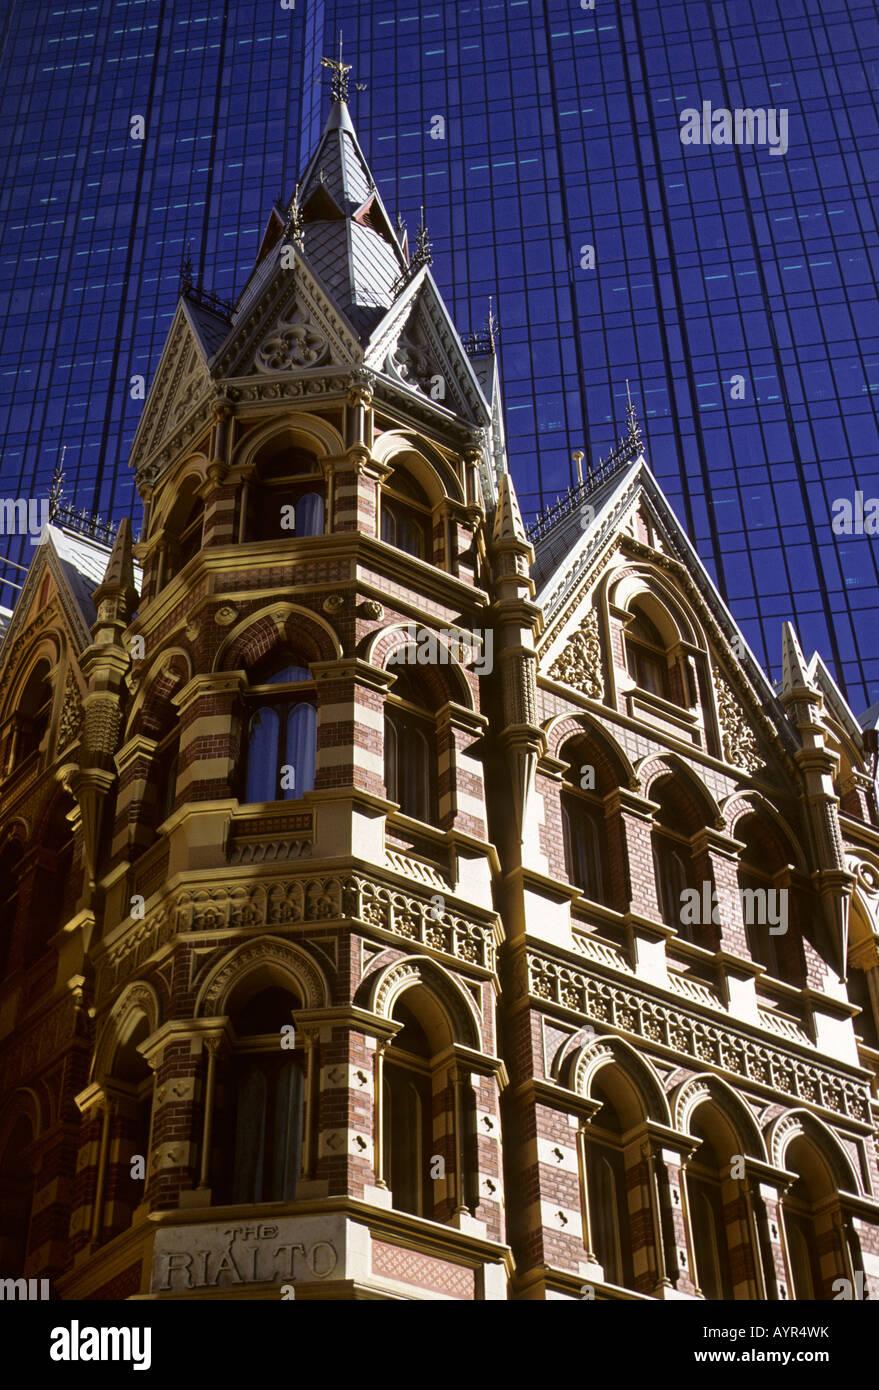 The Rialto Hotel in front of the glass facade of the Rialto Towers in Melbourne, Victoria, Australia Stock Photo